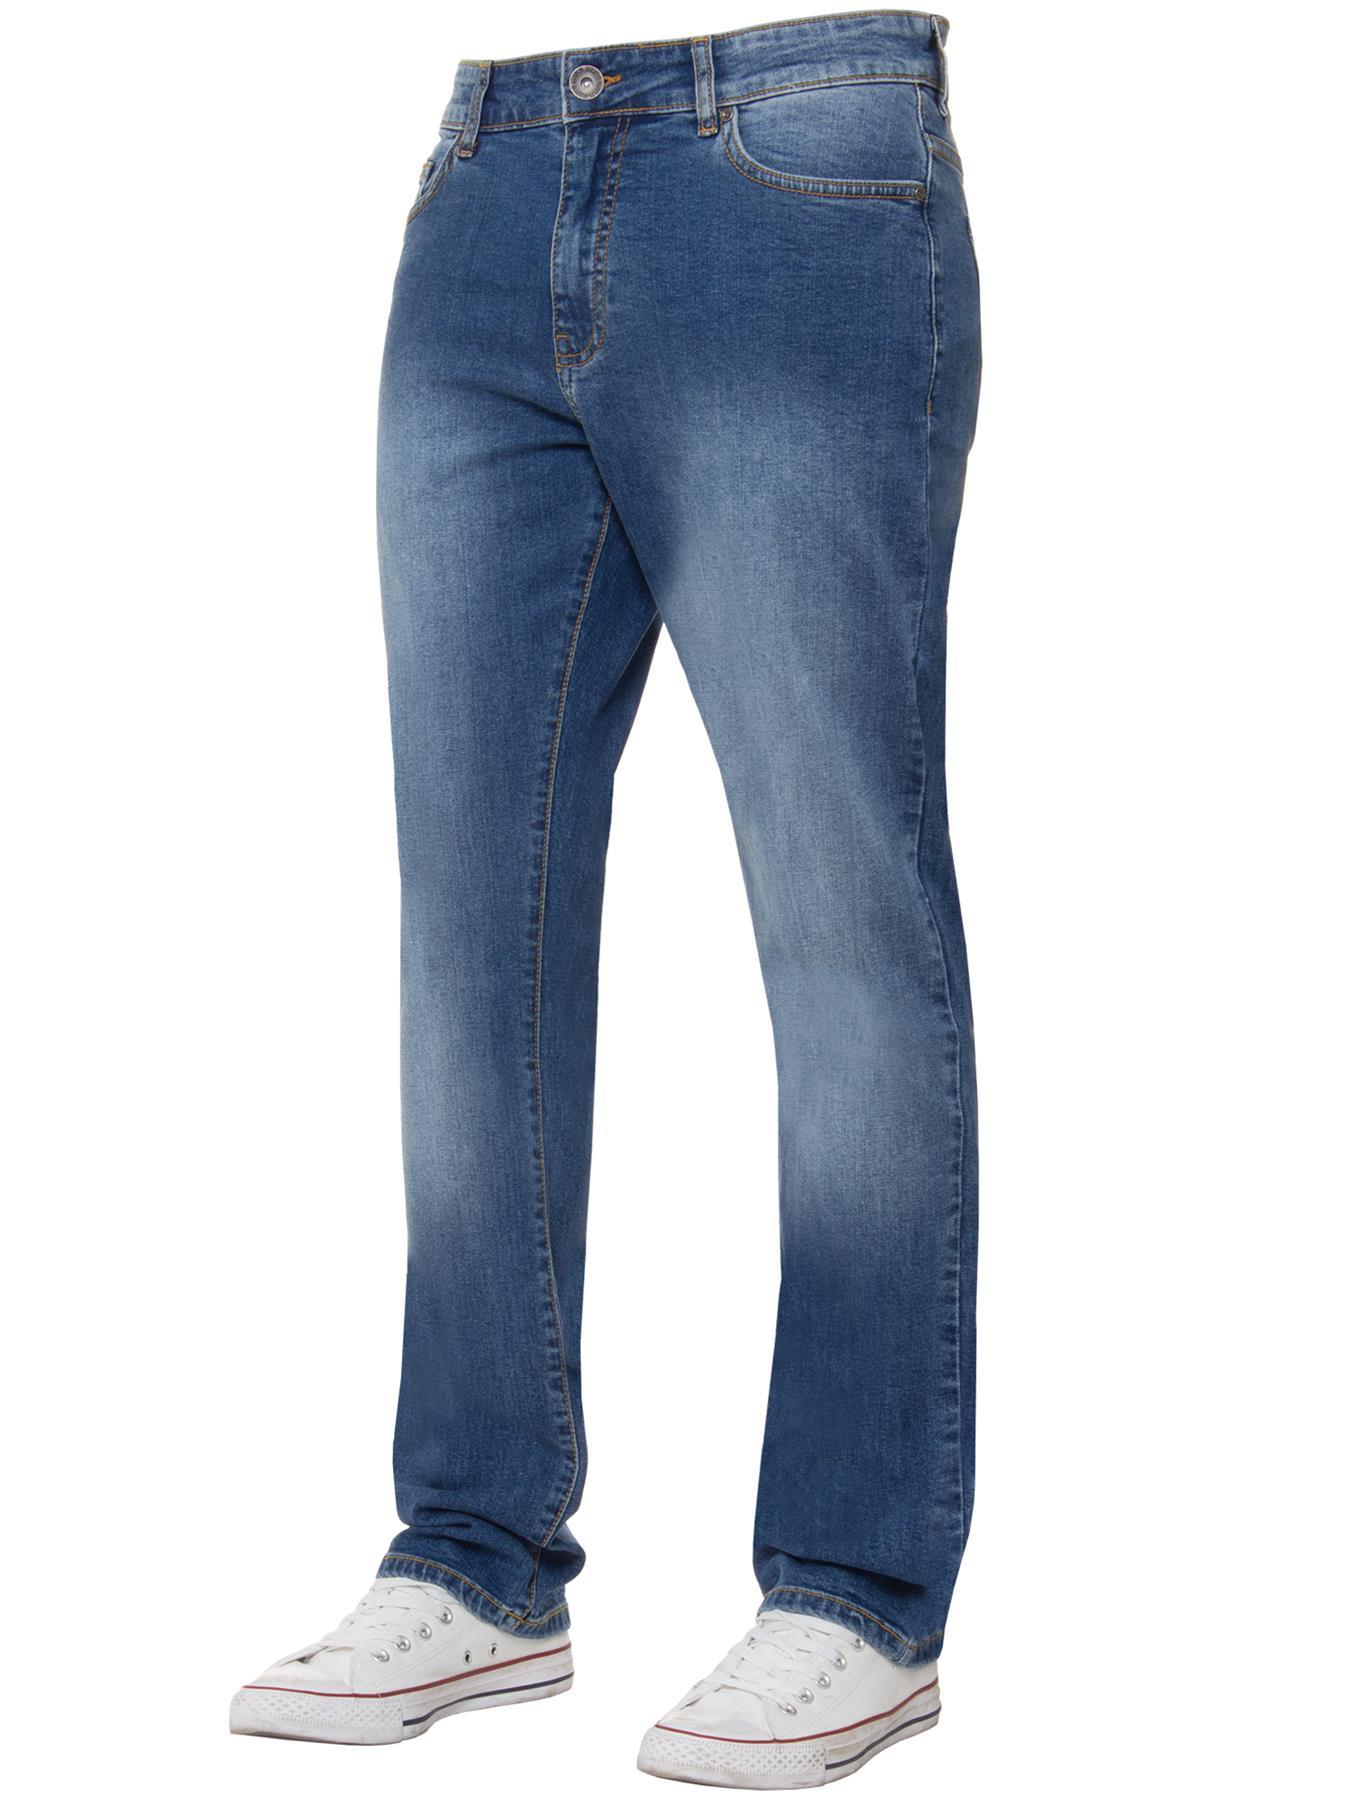 Para-Hombre-Pierna-Recta-Bootcut-Stretch-Denim-Regulares-Pantalon-de-trabajo-Kruze-Todas-Cinturas miniatura 9